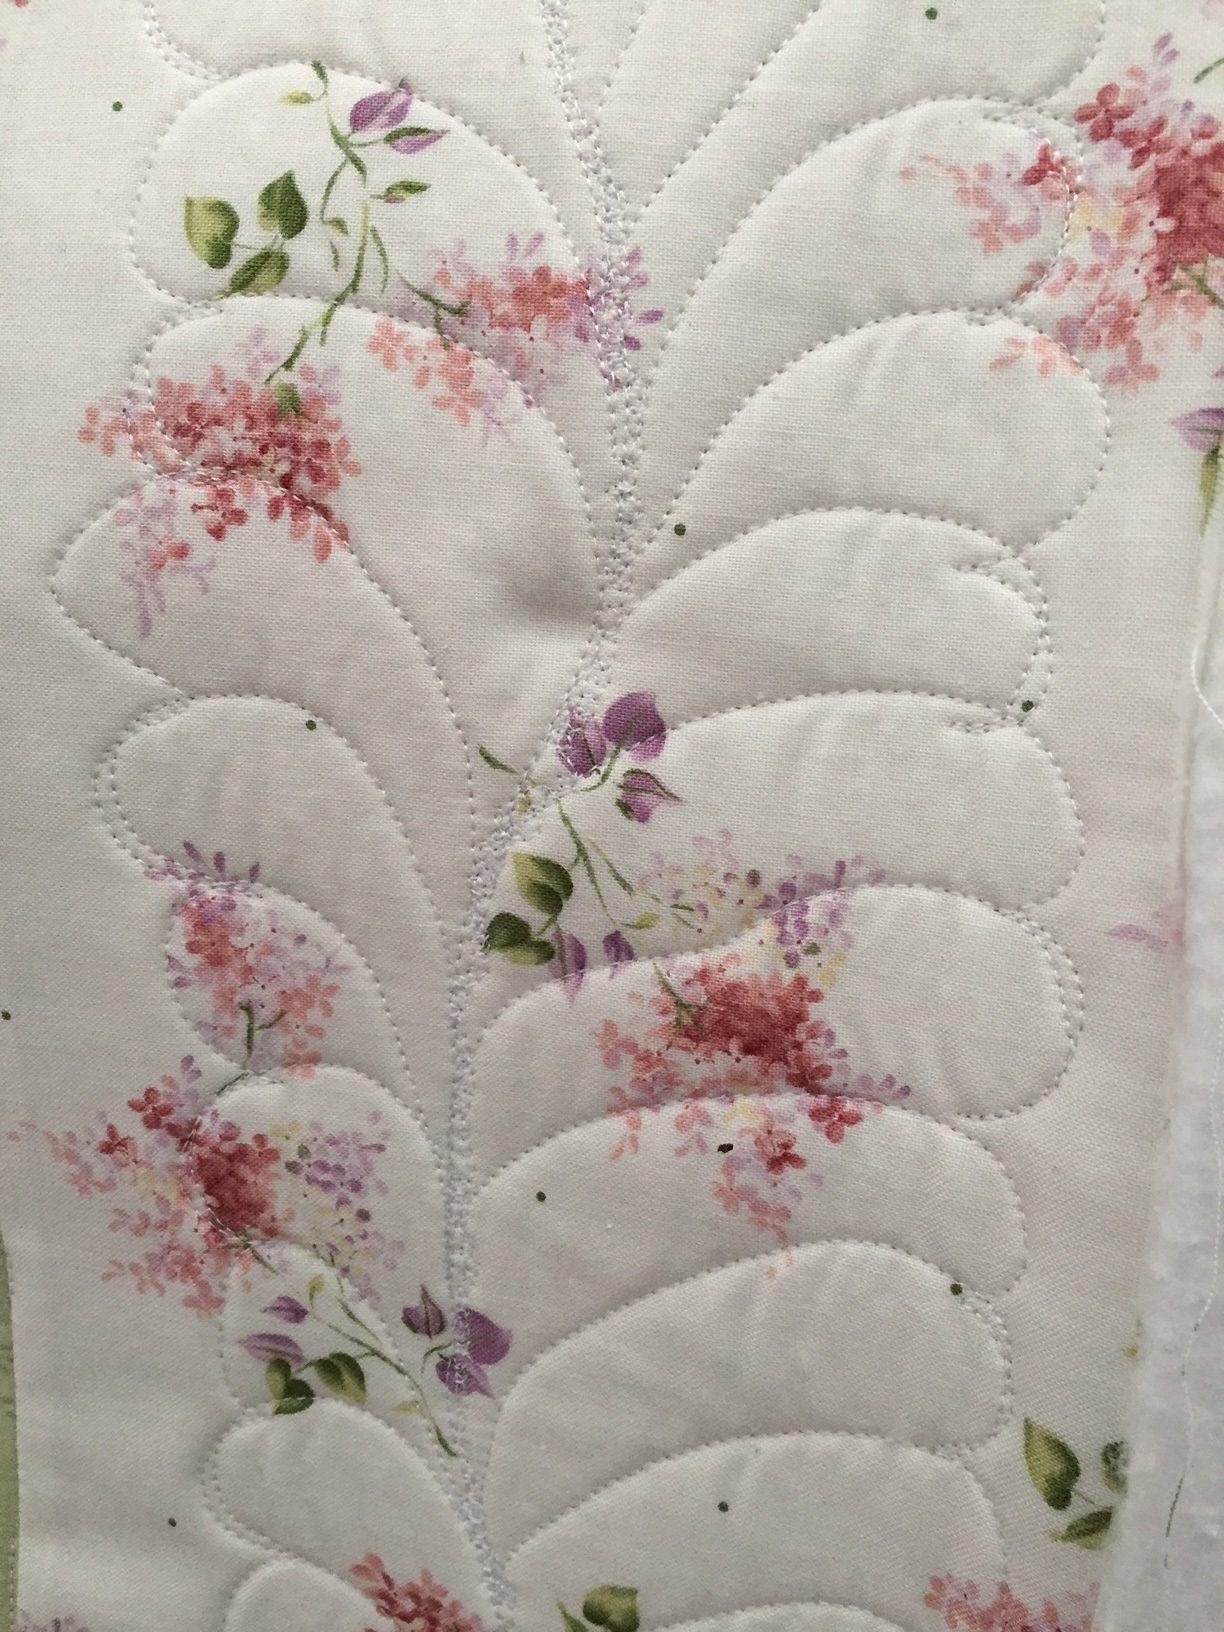 Longarm Border Designs on Cathy's Quilt.jpg